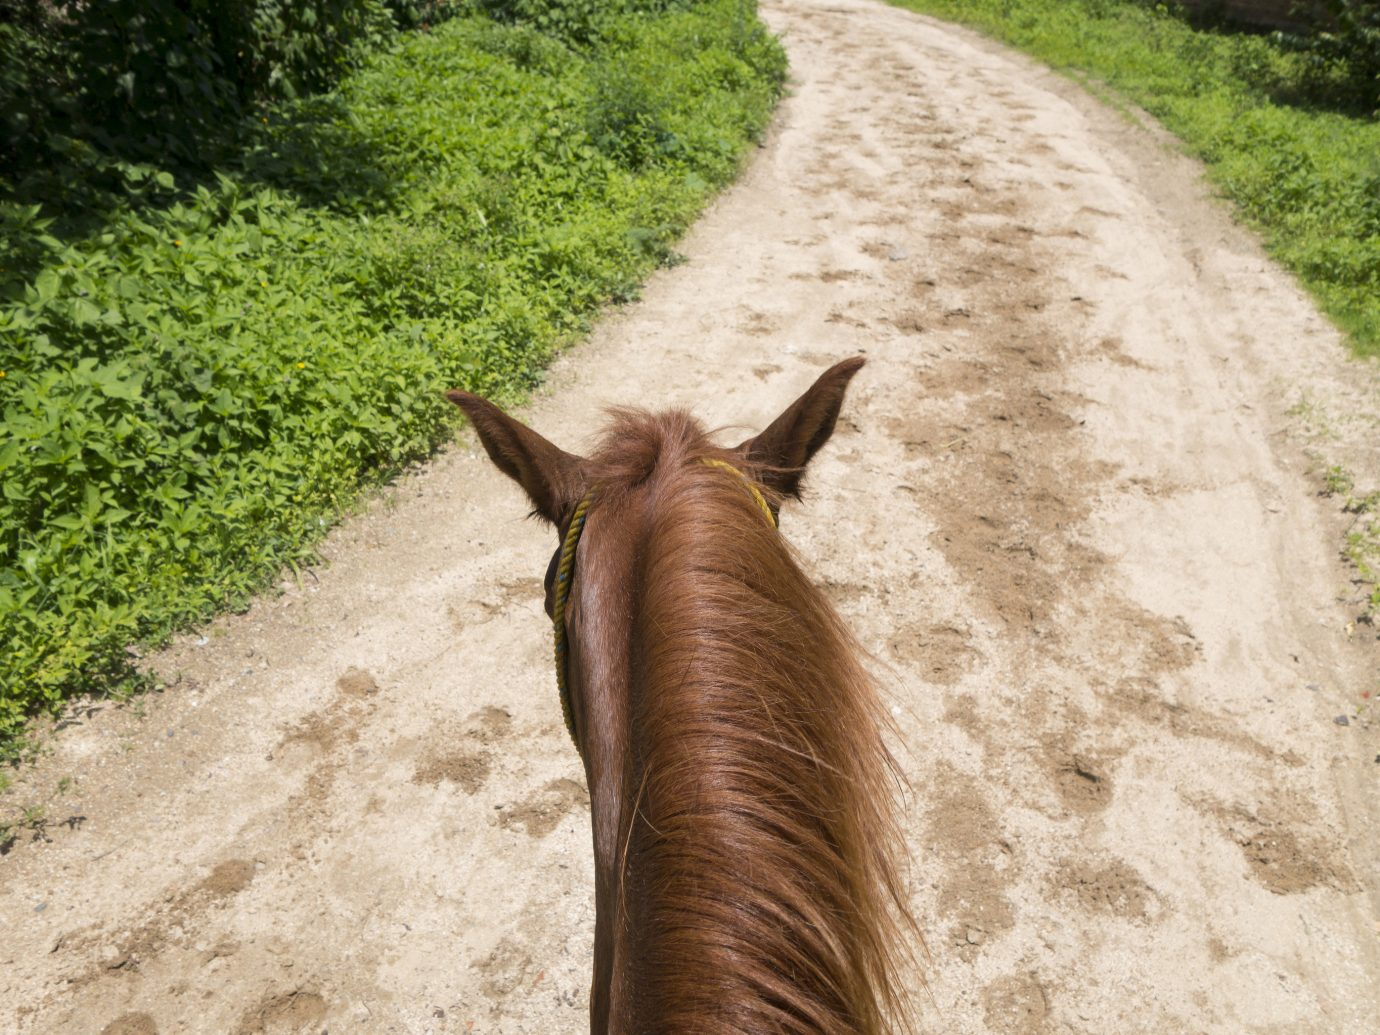 Offbeat outdoor ground tree grass mammal fauna path animal dirt soil Wildlife horse like mammal trail horse